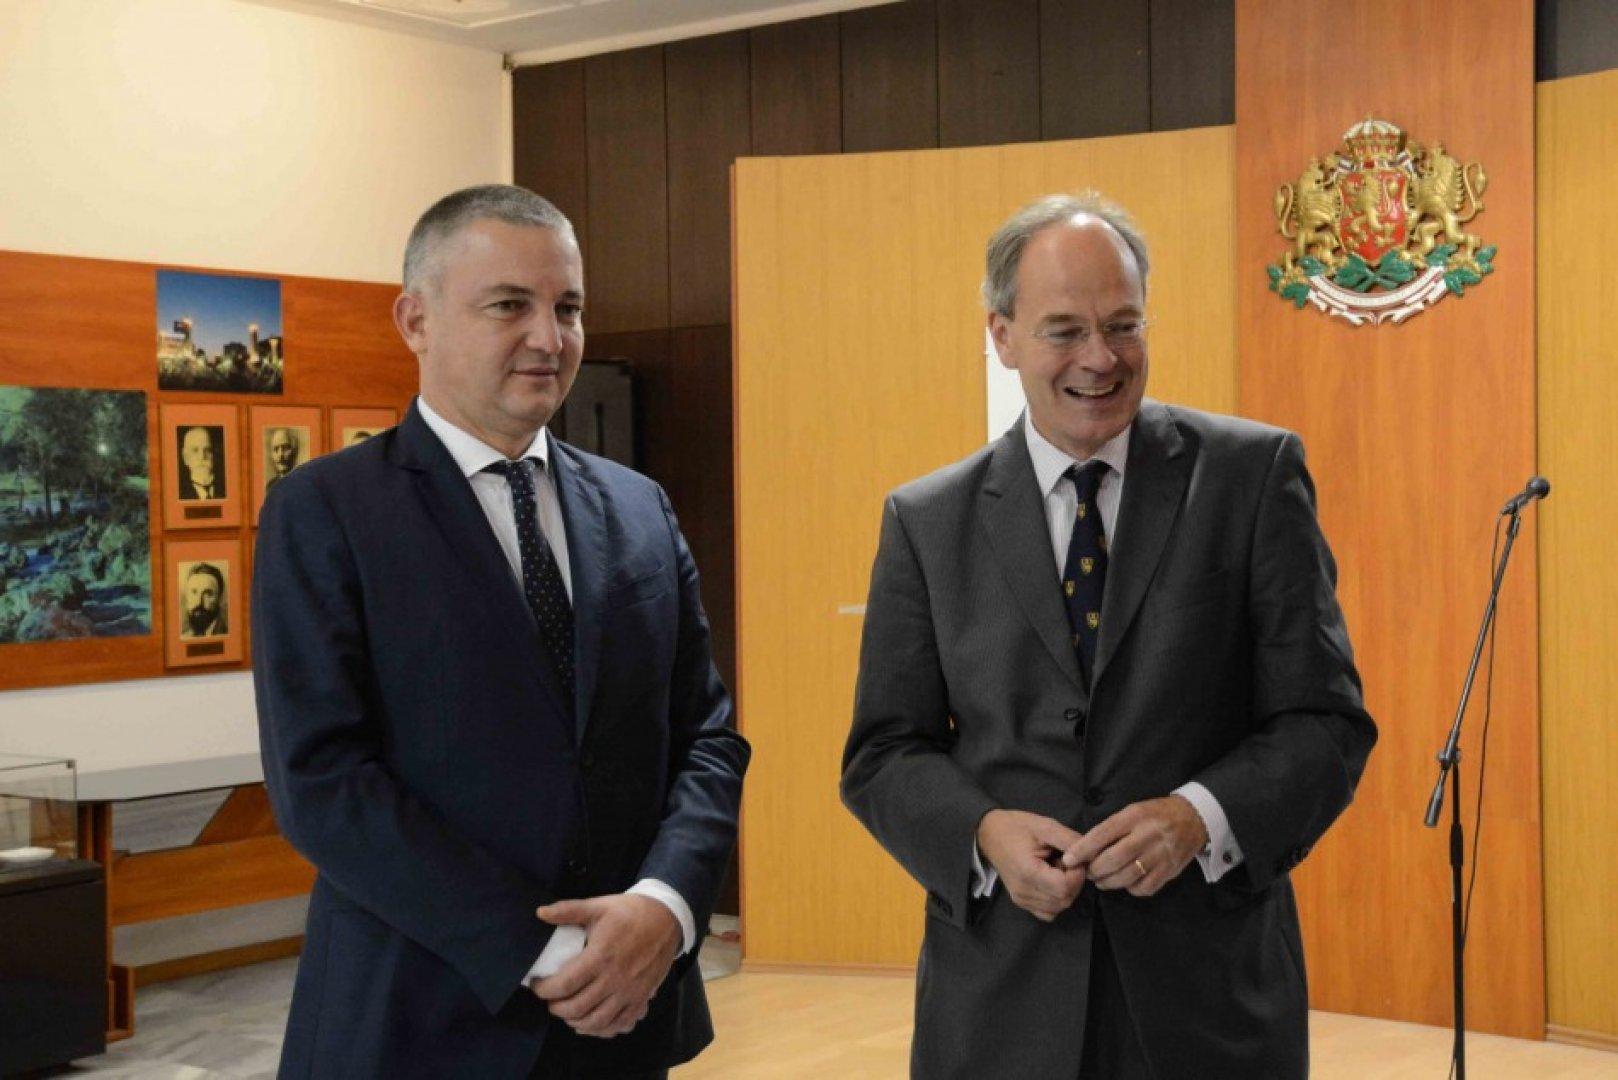 Посланикът на Германия у нас Кристоф Айххорн (вдясно) се срещна с кмета на Варна Иван Портних. Снимки Община Варна